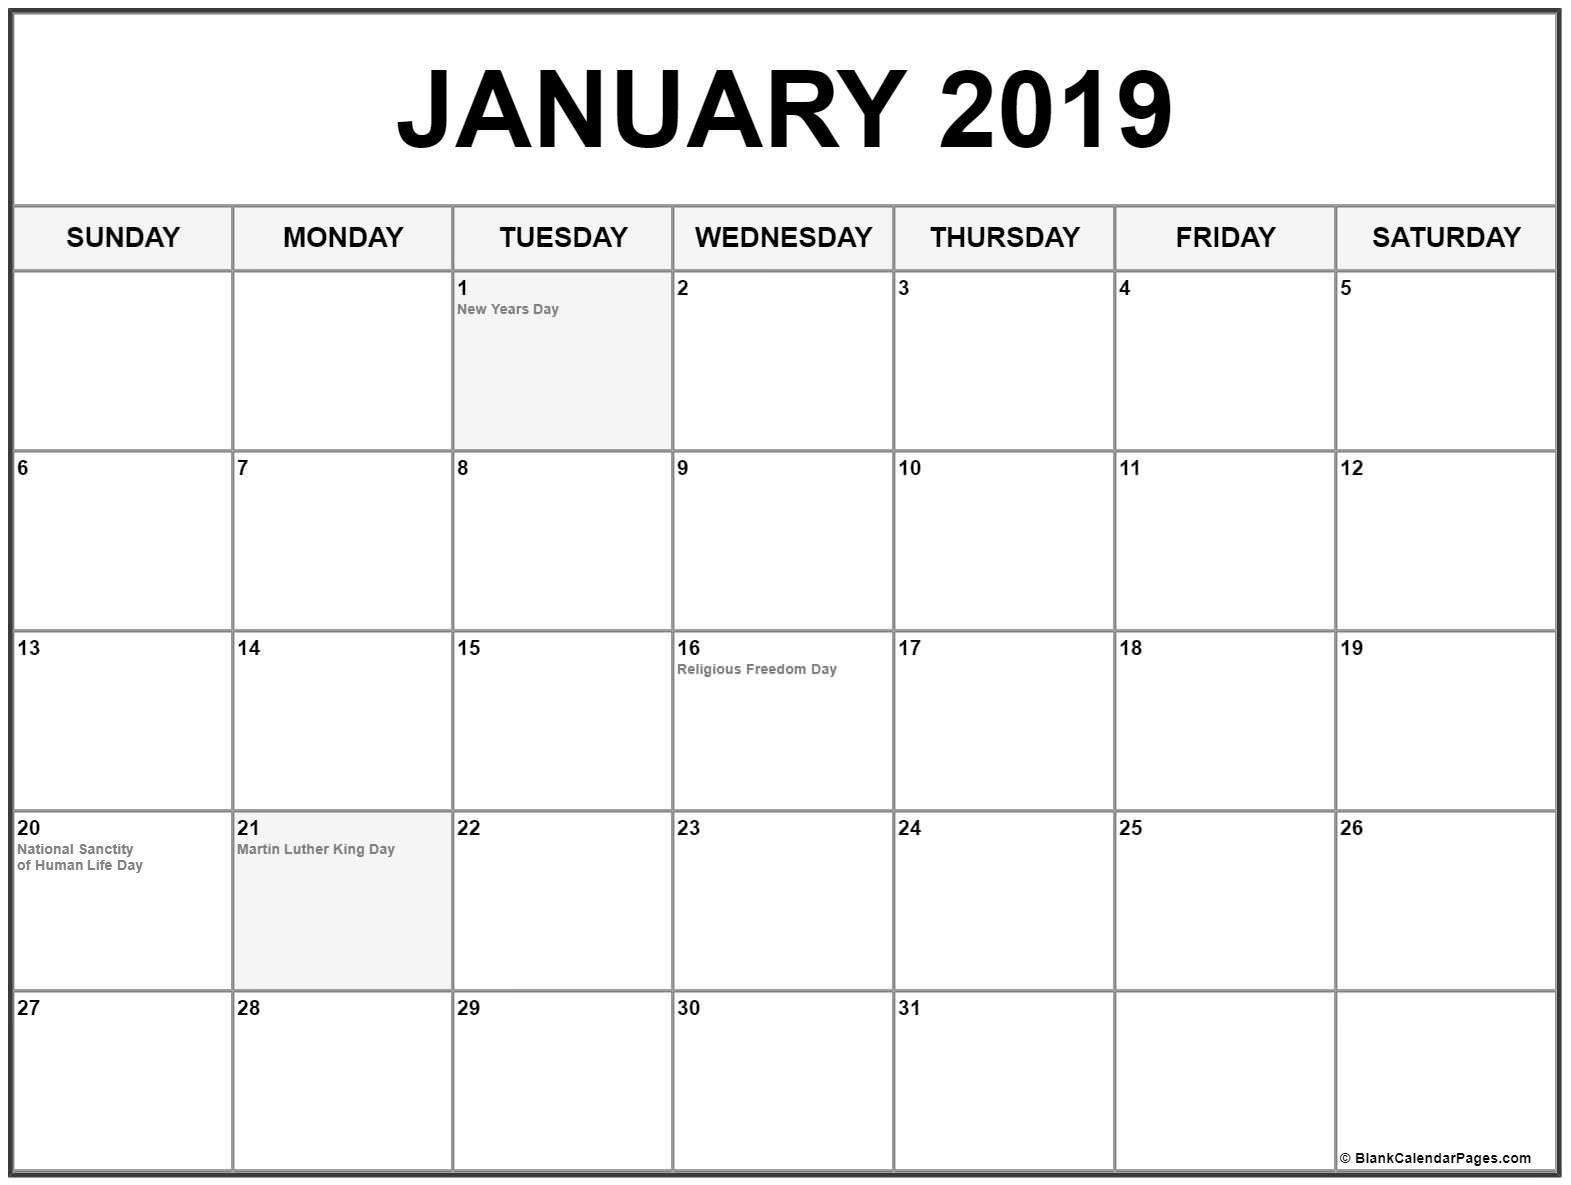 January 2019 Calendar With Holidays | Holiday Calendars | January regarding January Calendar Printable Template With Holidays